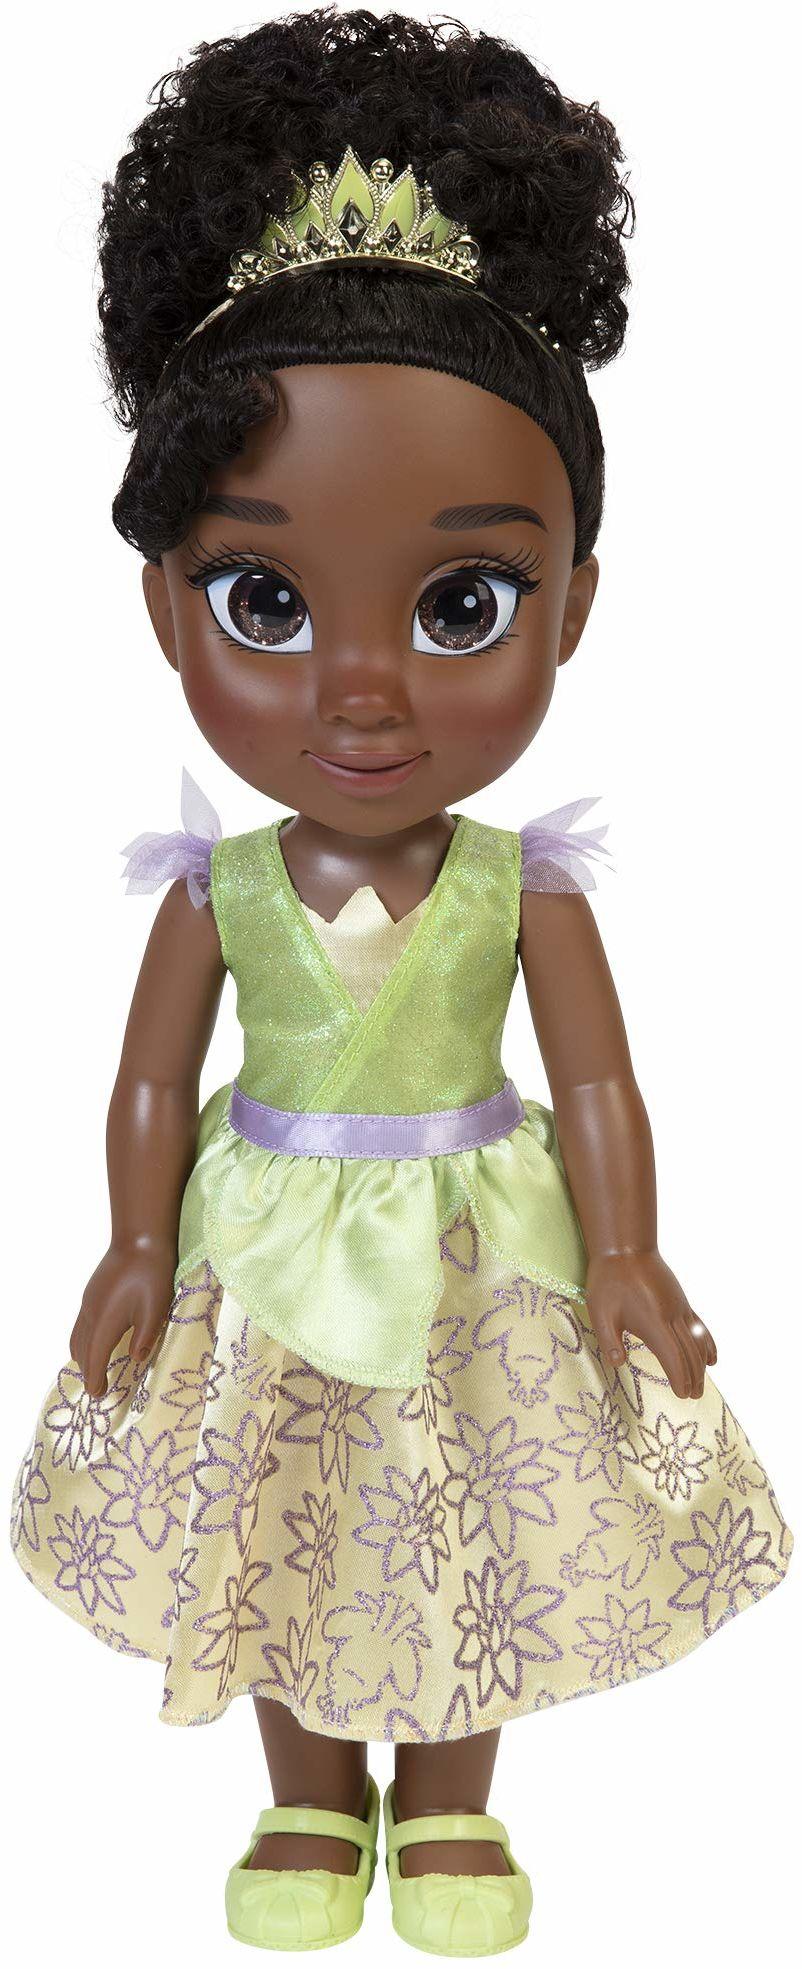 Disney Princess Friend Tiana Doll